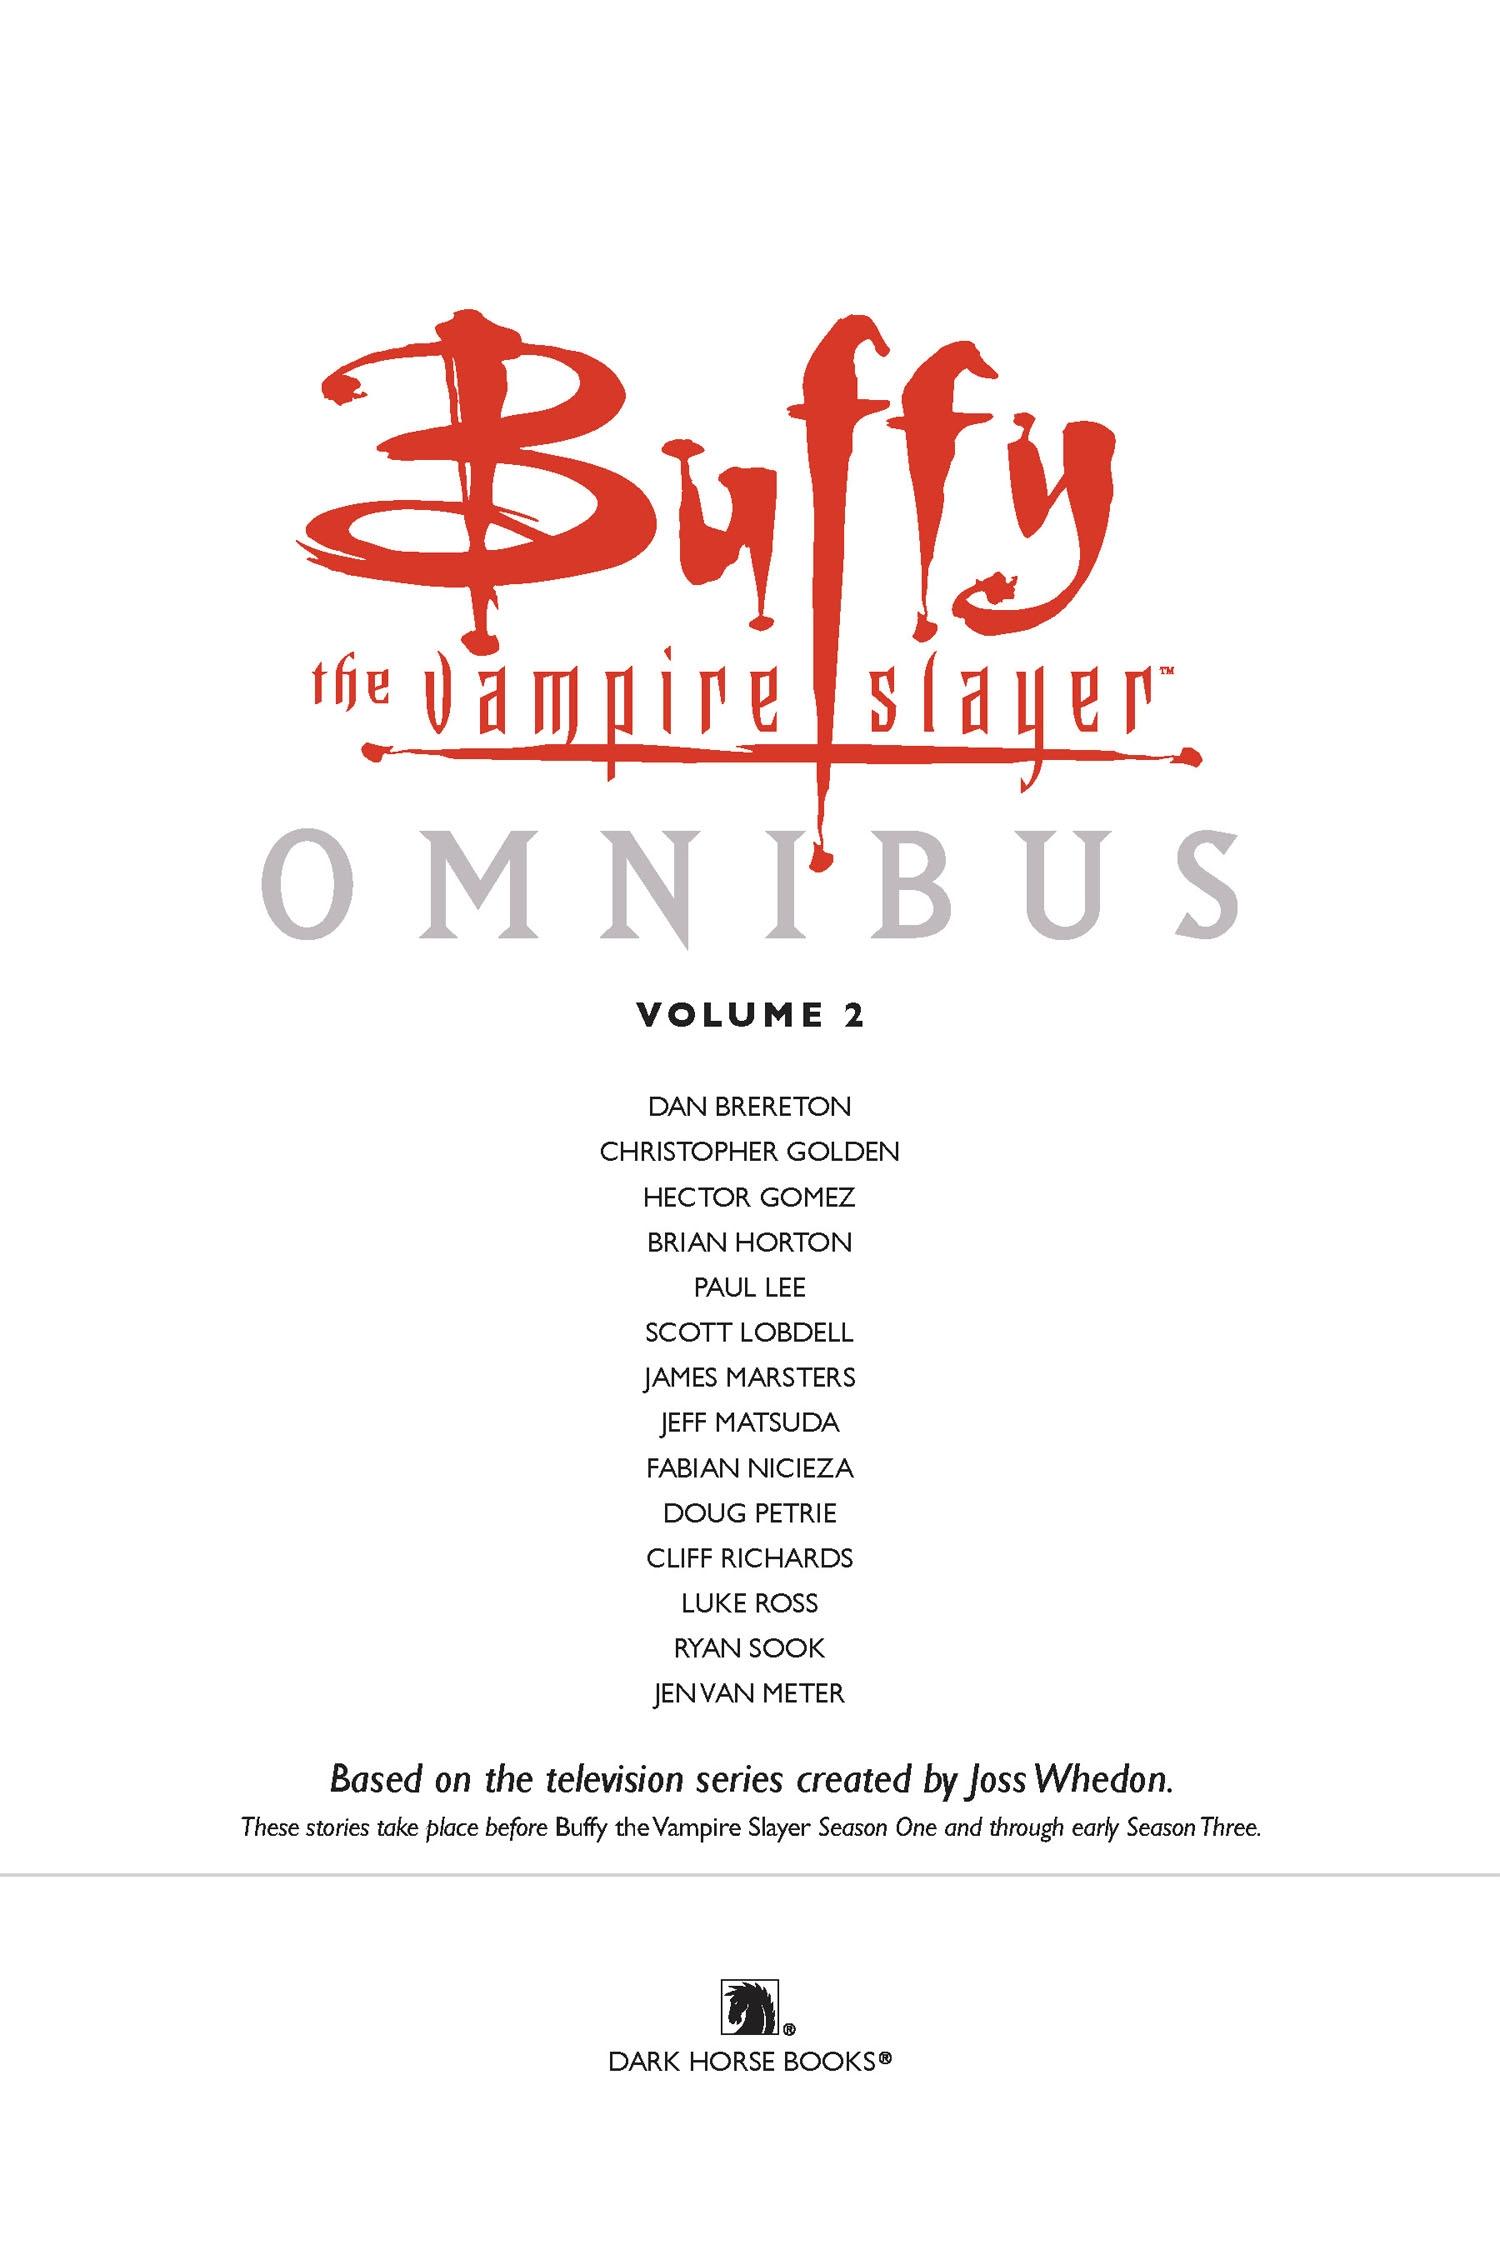 Read online Buffy the Vampire Slayer: Omnibus comic -  Issue # TPB 2 - 4